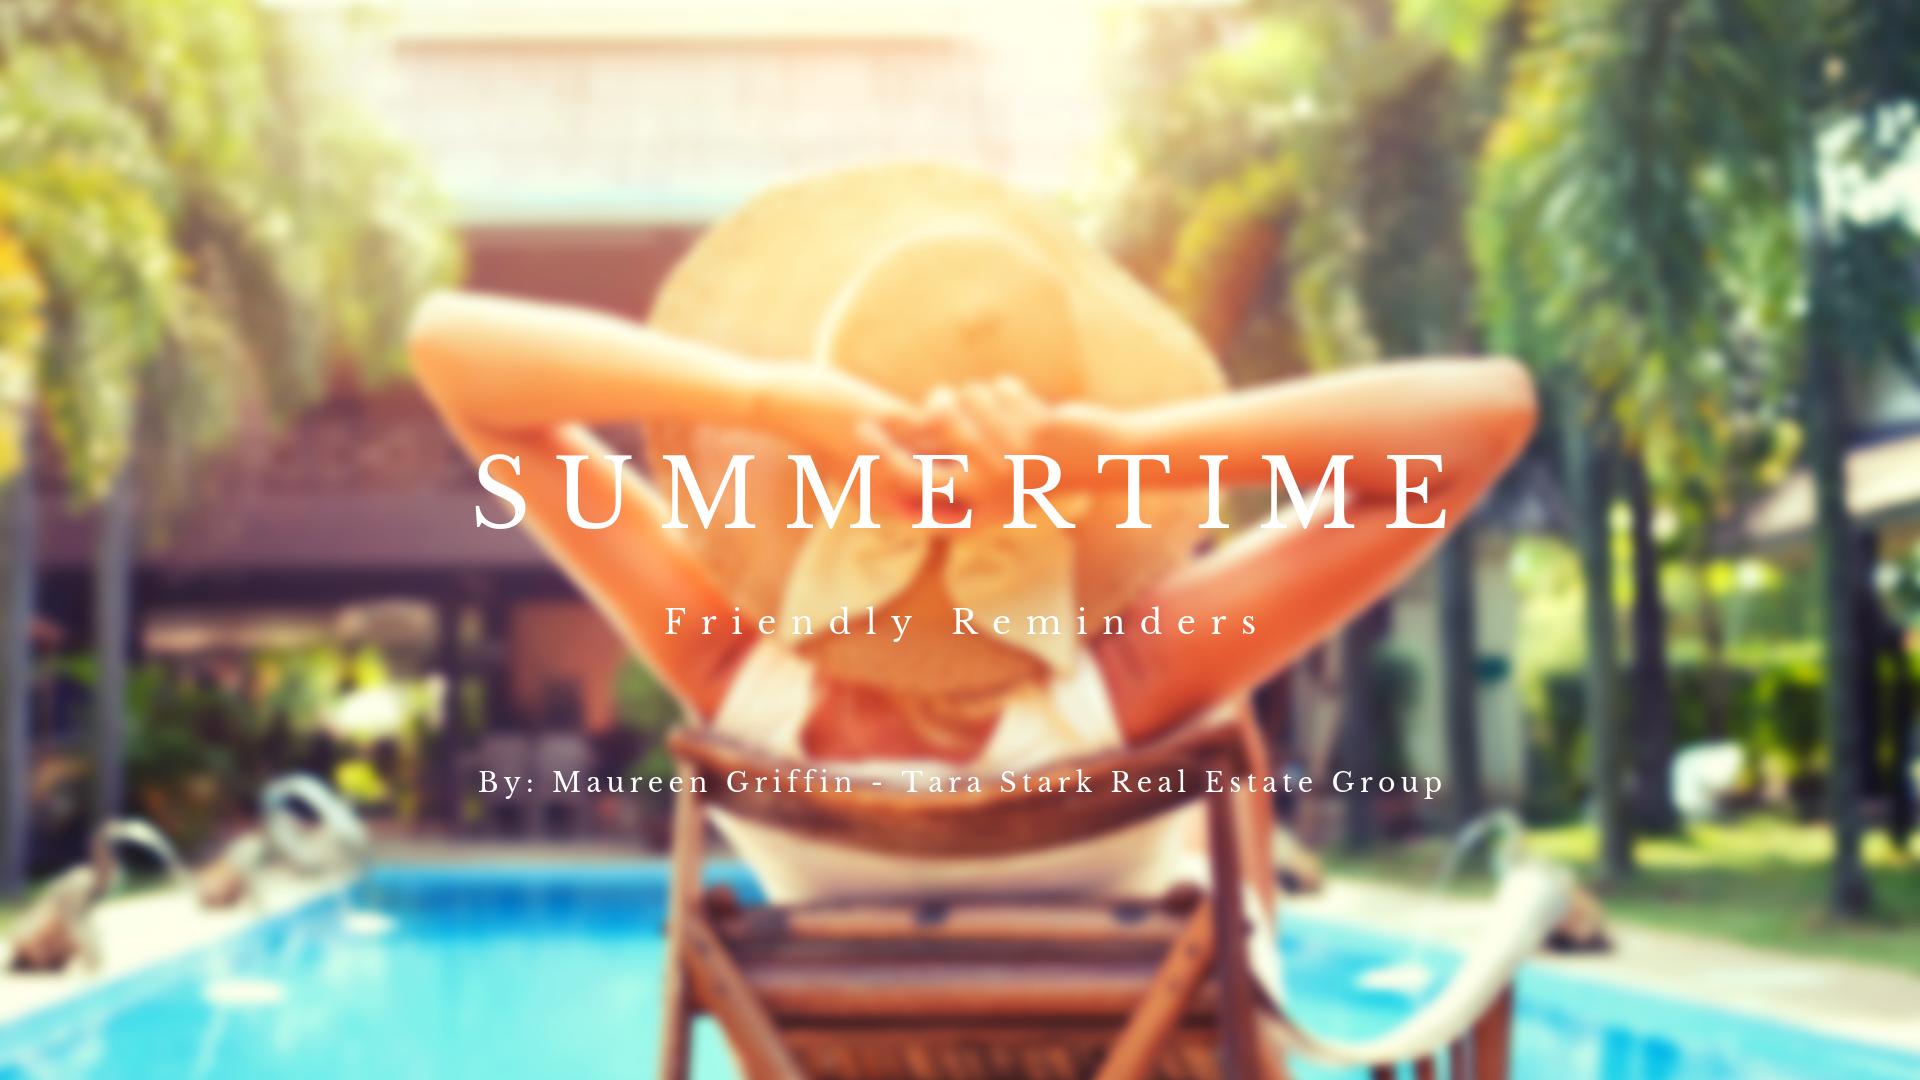 Summertime Friendly Reminders